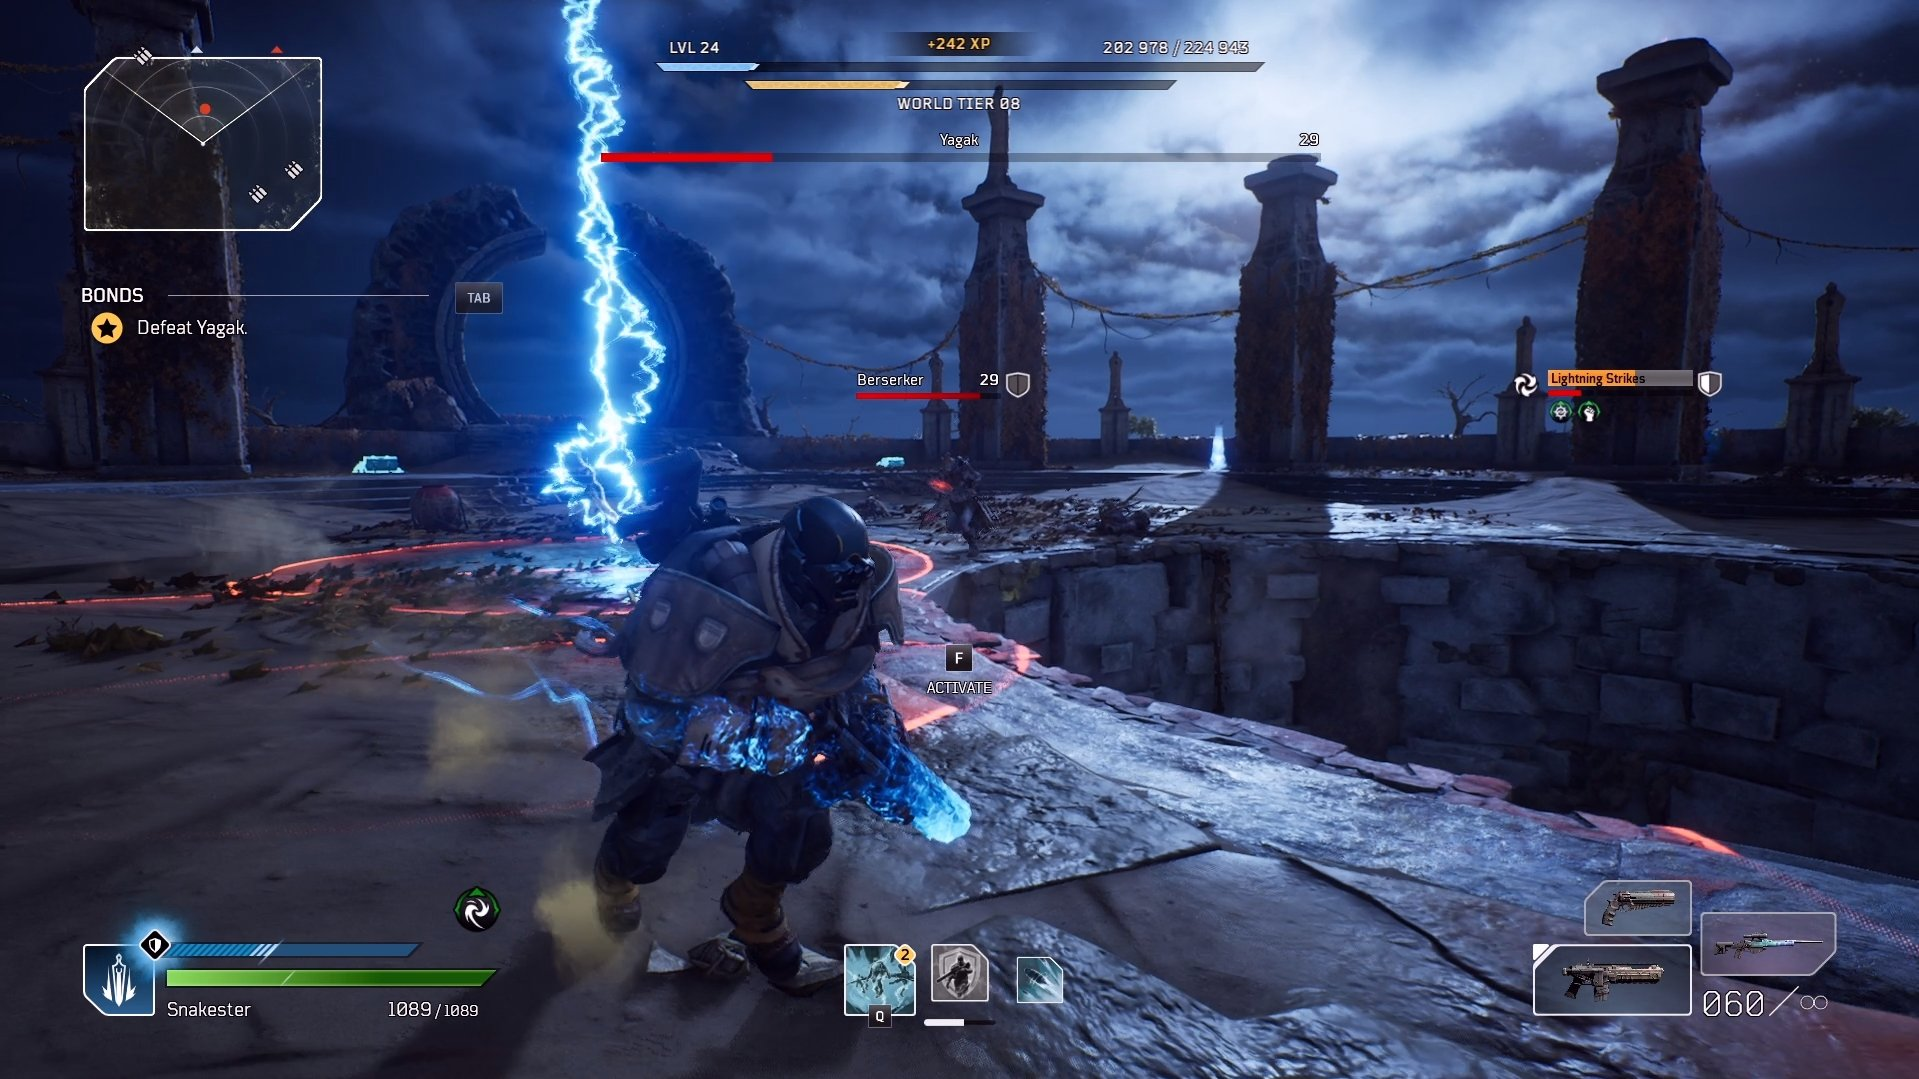 Outriders - Lightning Strikes AoE